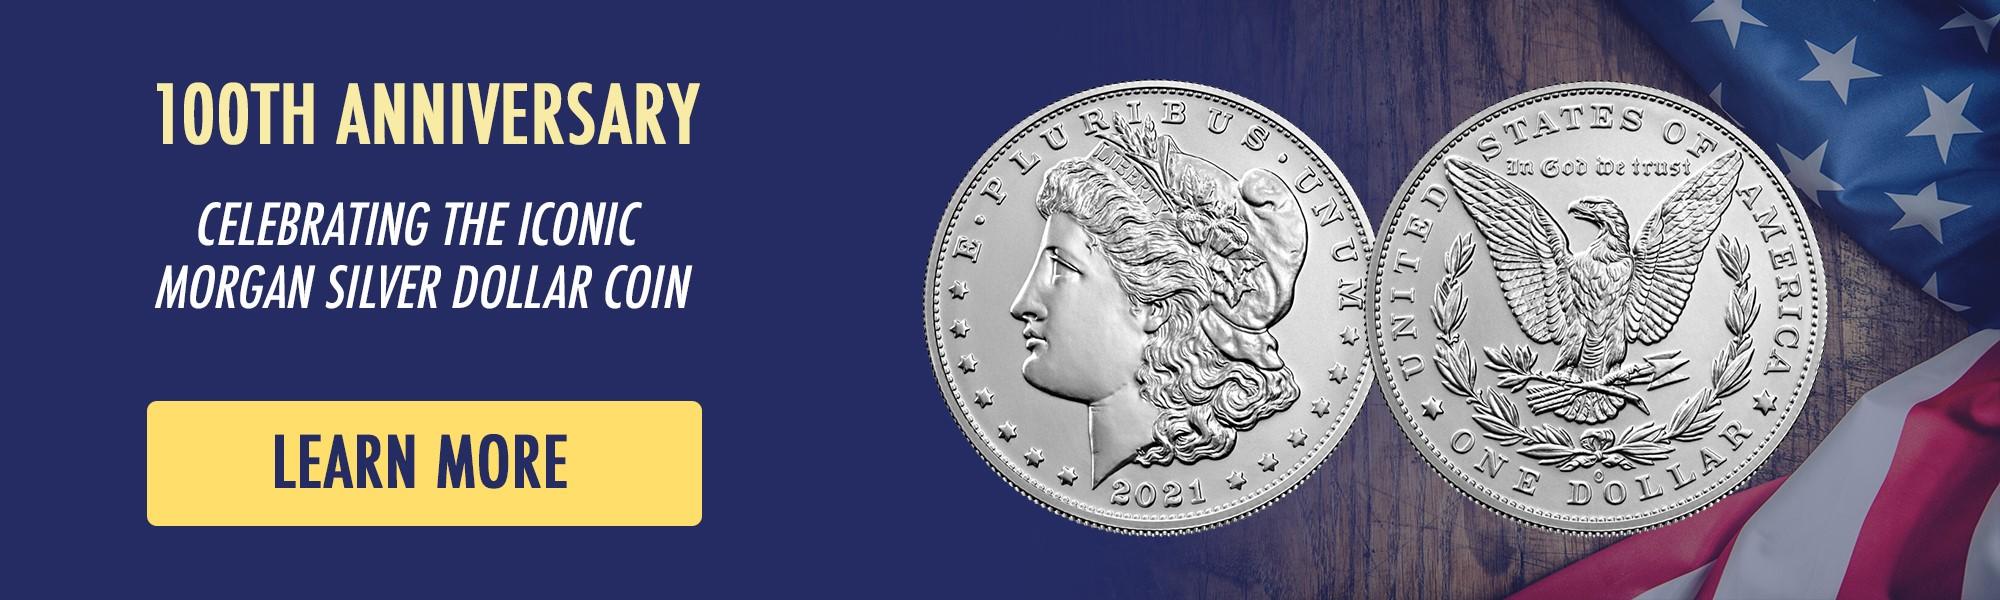 Order Now 2021 Morgan Silver Dollar 100th Anniversary Coins